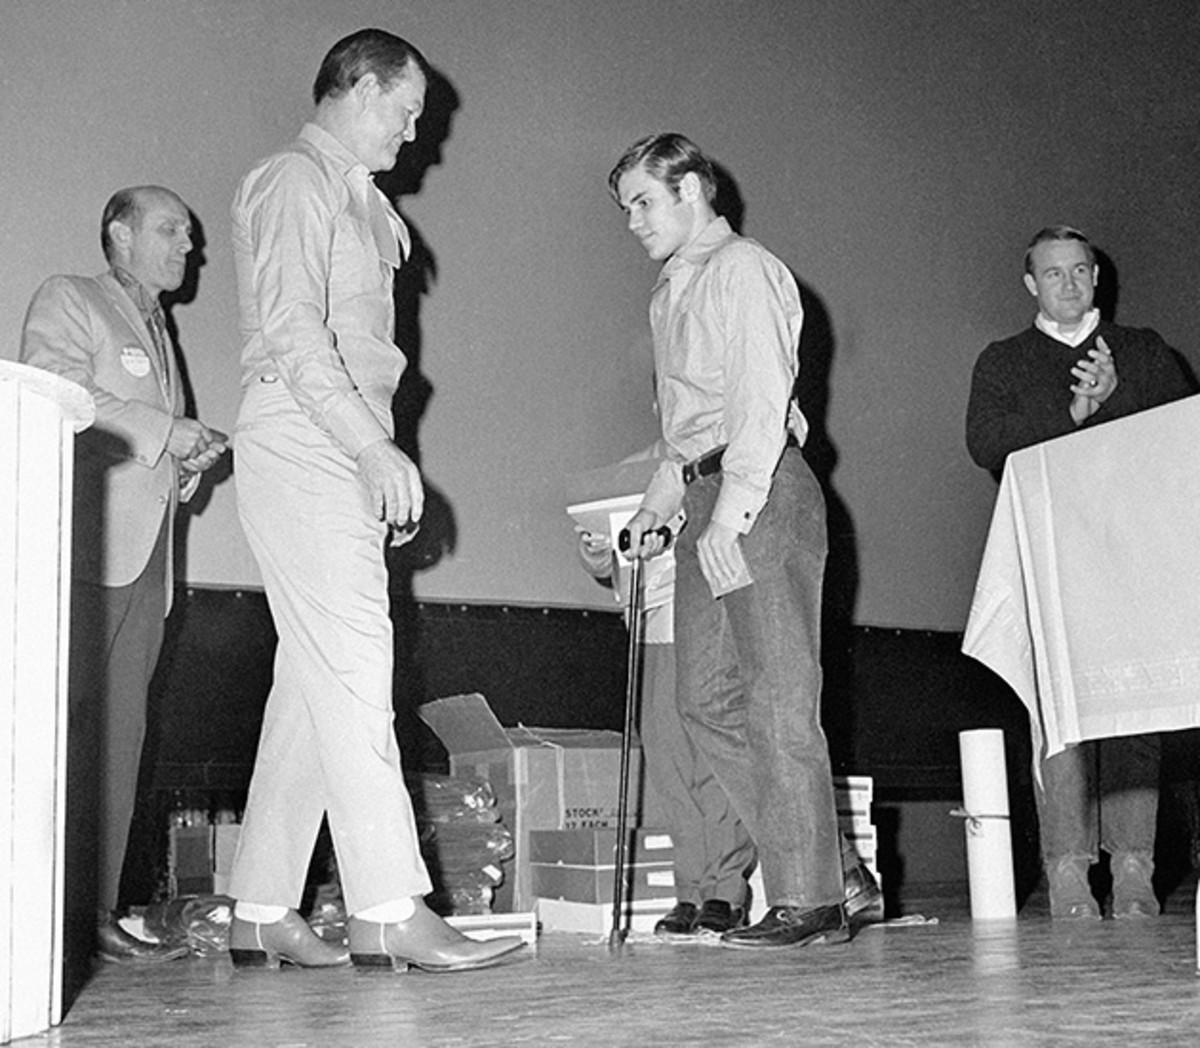 Steinmark receives his letter for the 1969 season.